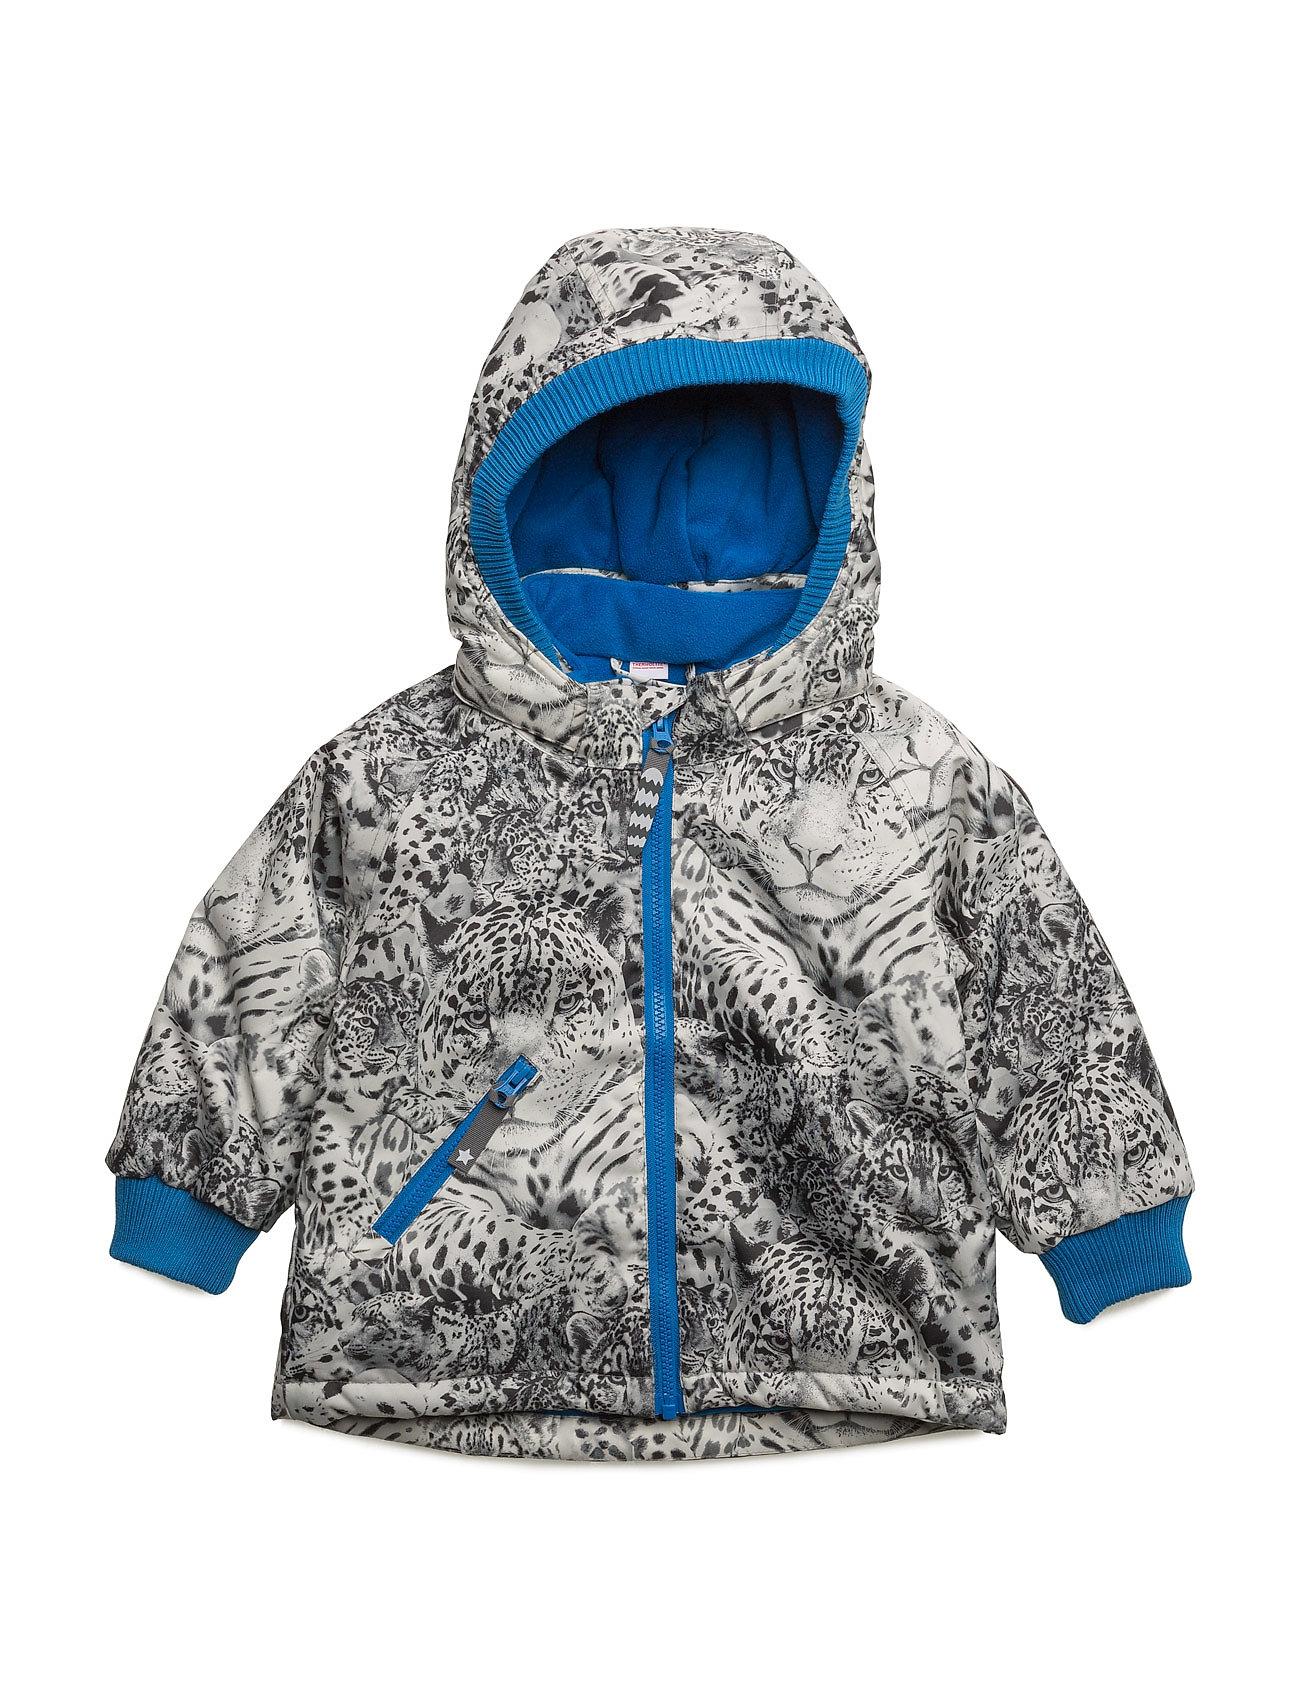 racoon outdoor Leo leopard jacket på boozt.com dk